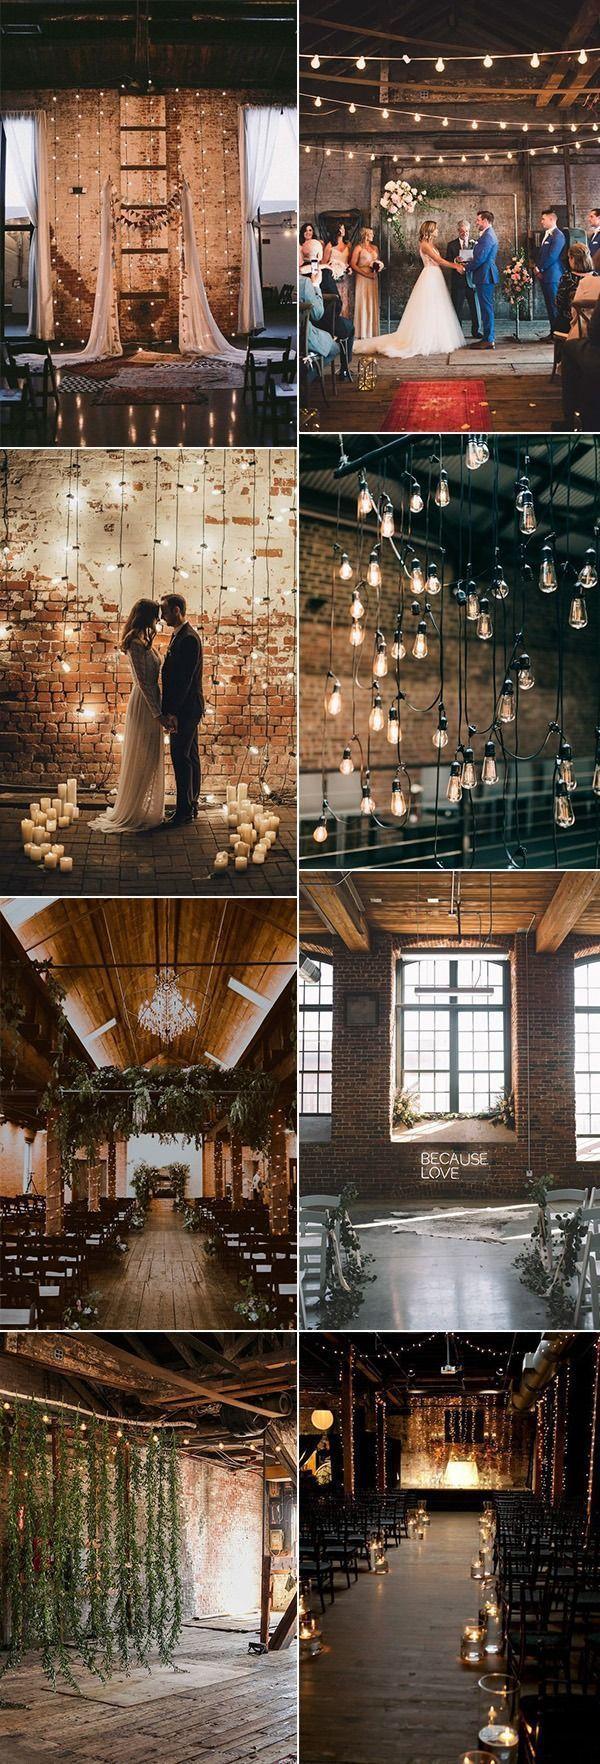 Trending Industrial Wedding Decoration Ideas Weddingday Romanticweddingreceptio In 2020 Industrial Wedding Decor Industrial Chic Wedding Industrial Wedding Ceremony